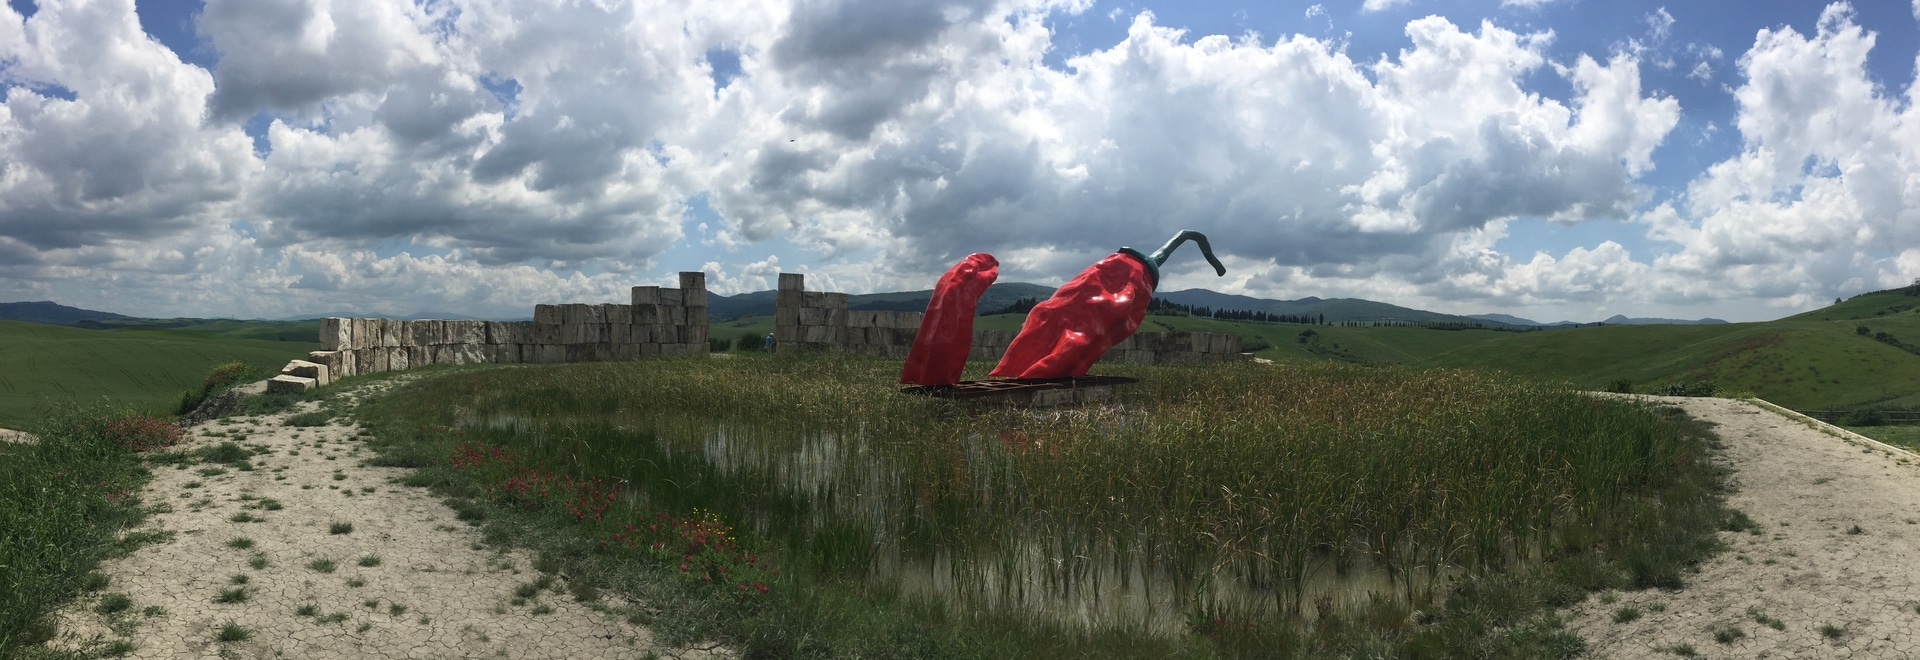 Micene travertine blocks and Giuseppe Carta's work